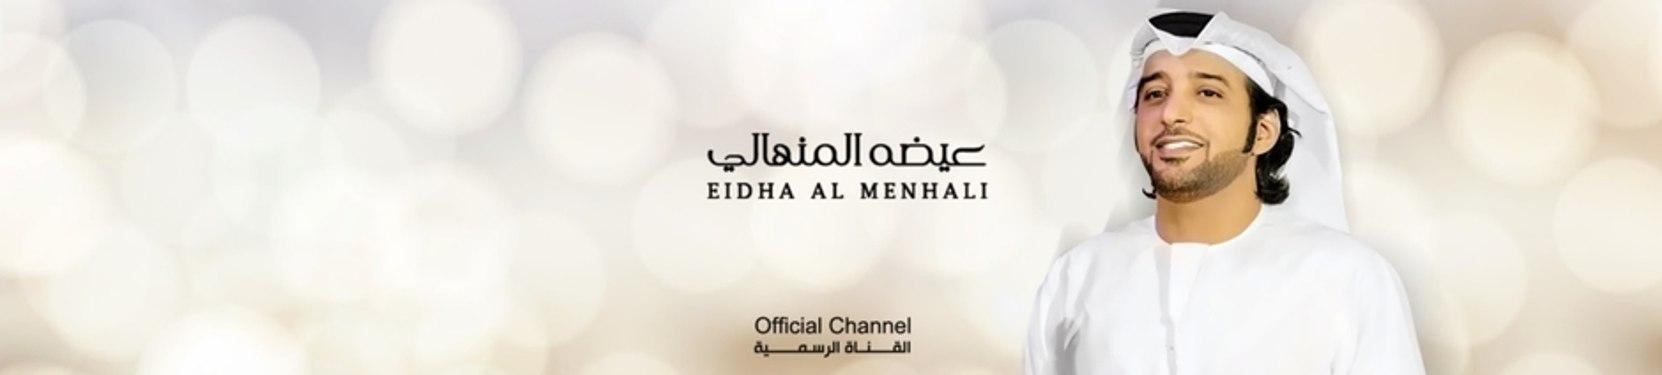 Eida Al Menhali | عيضه المنهالي